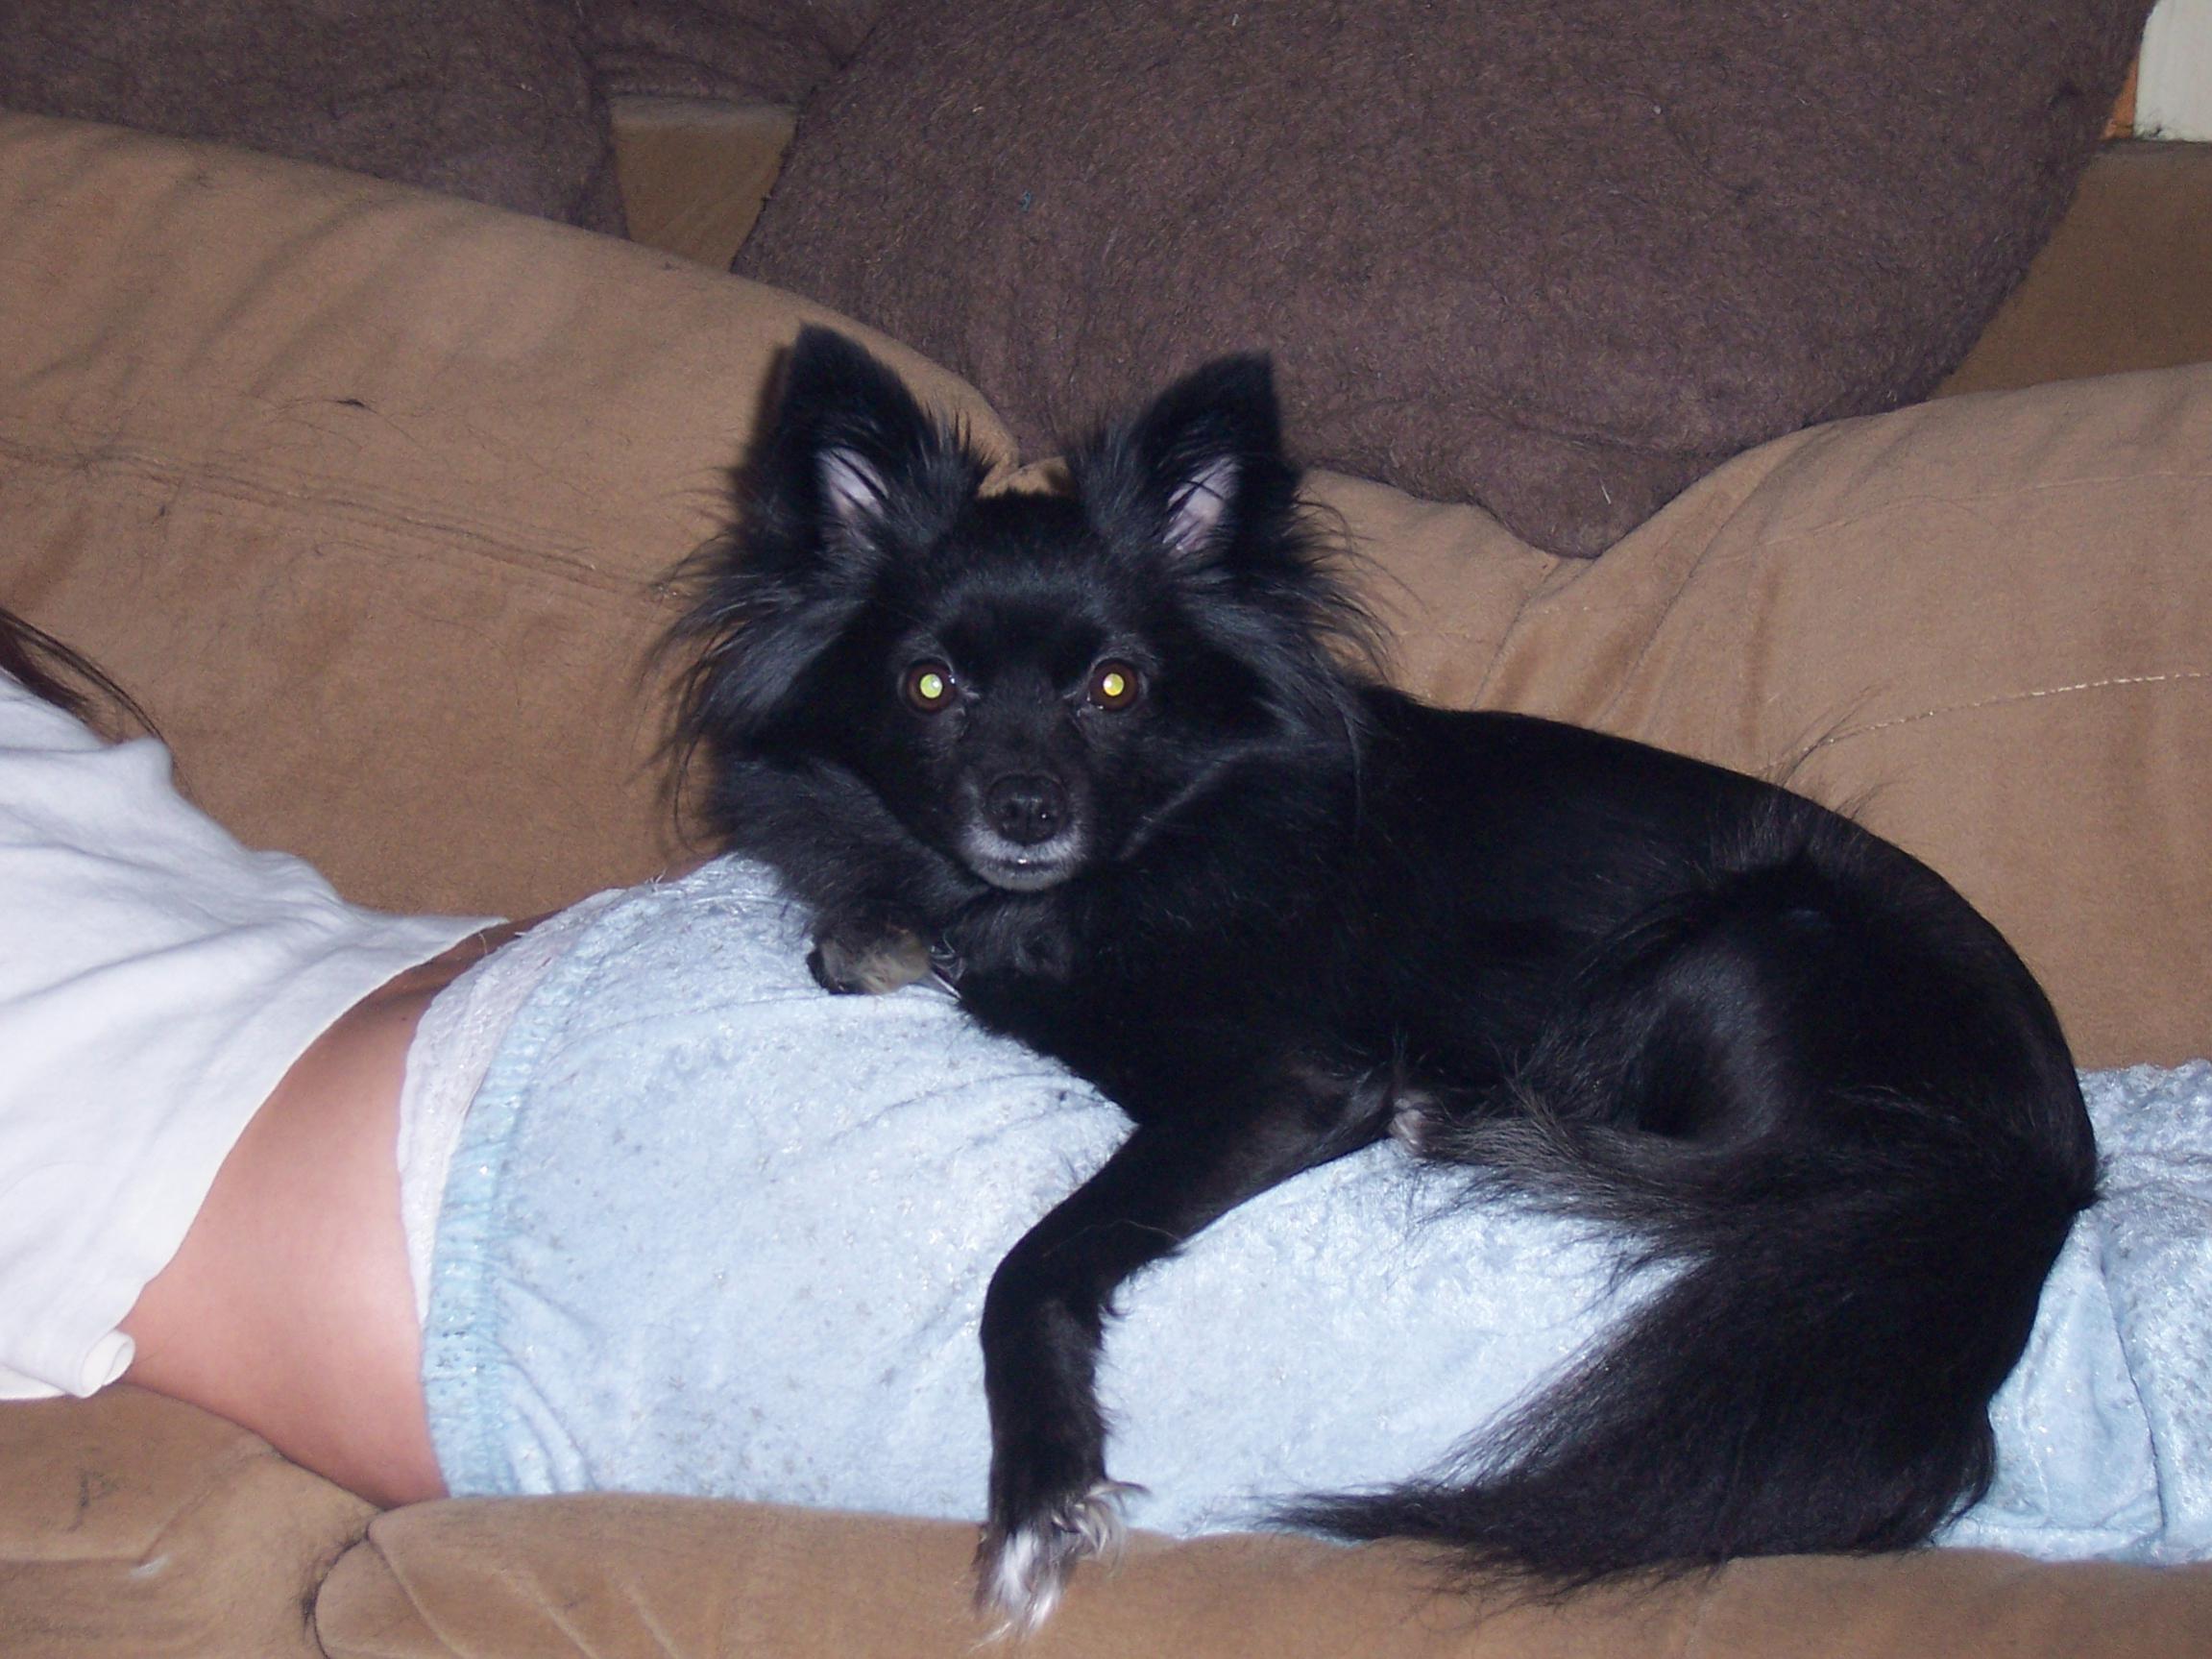 You think he'll make a good watch dog?-100_1434.jpg